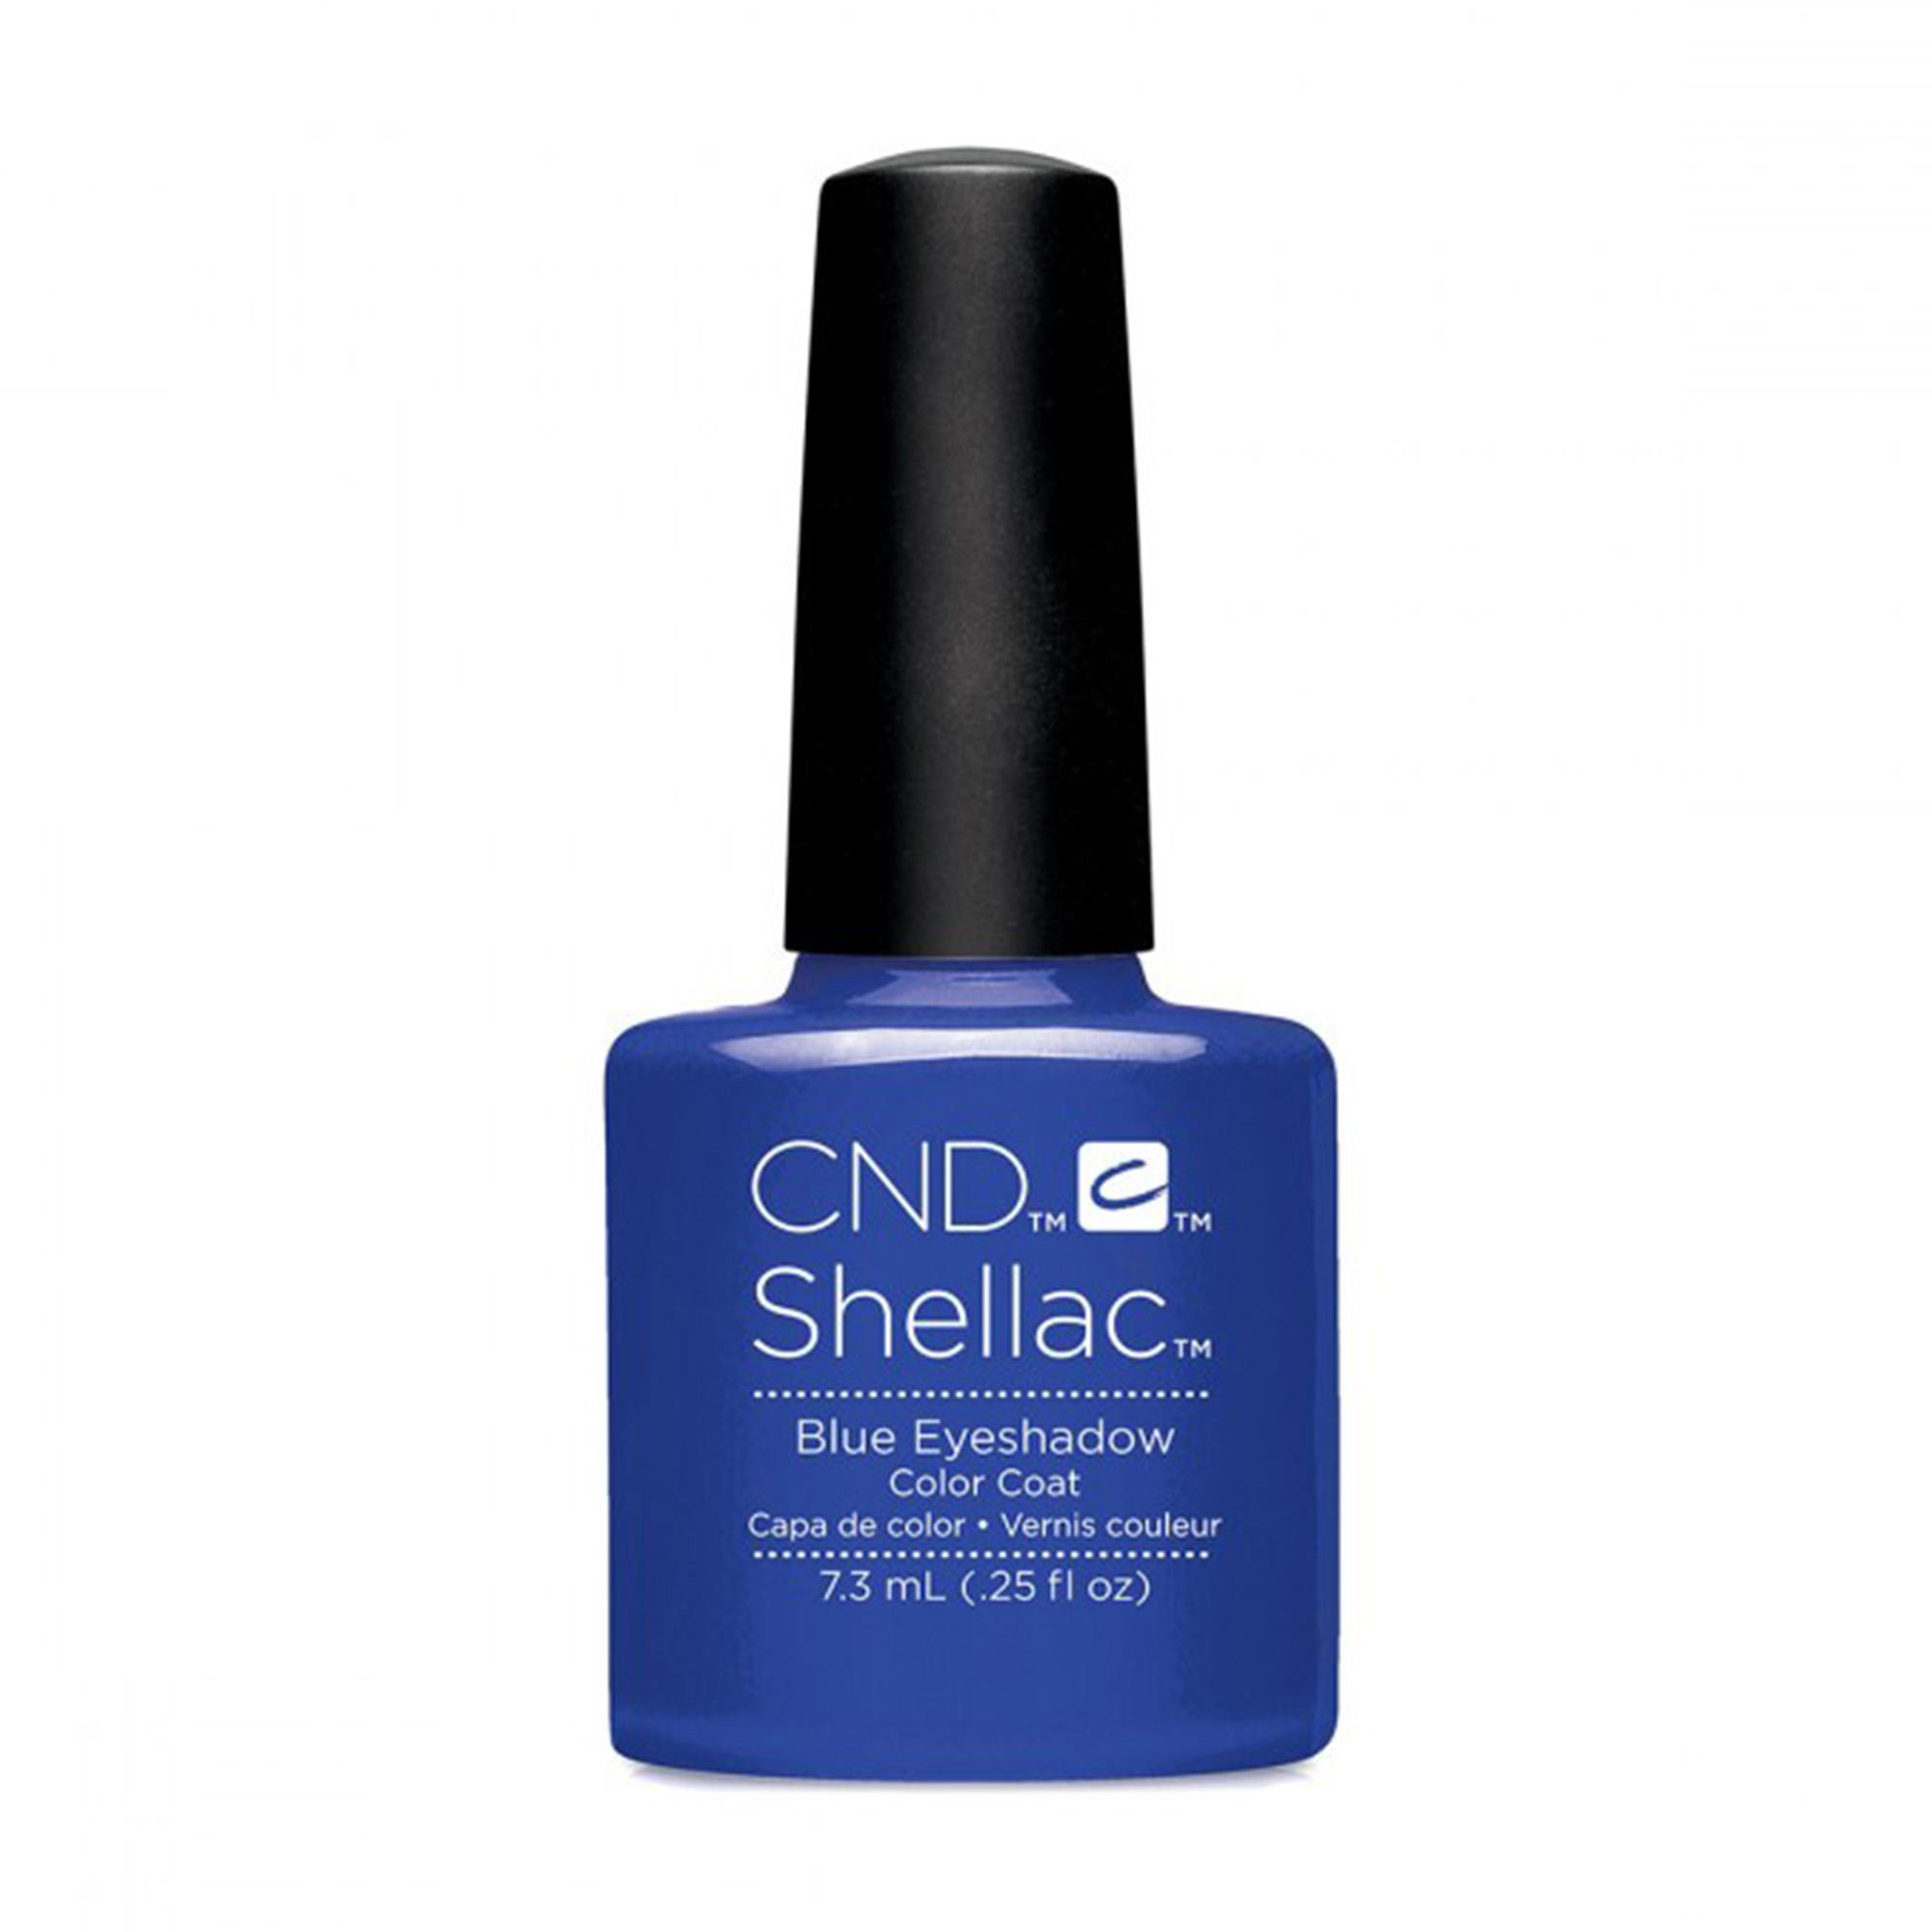 Summer nail polish -CND